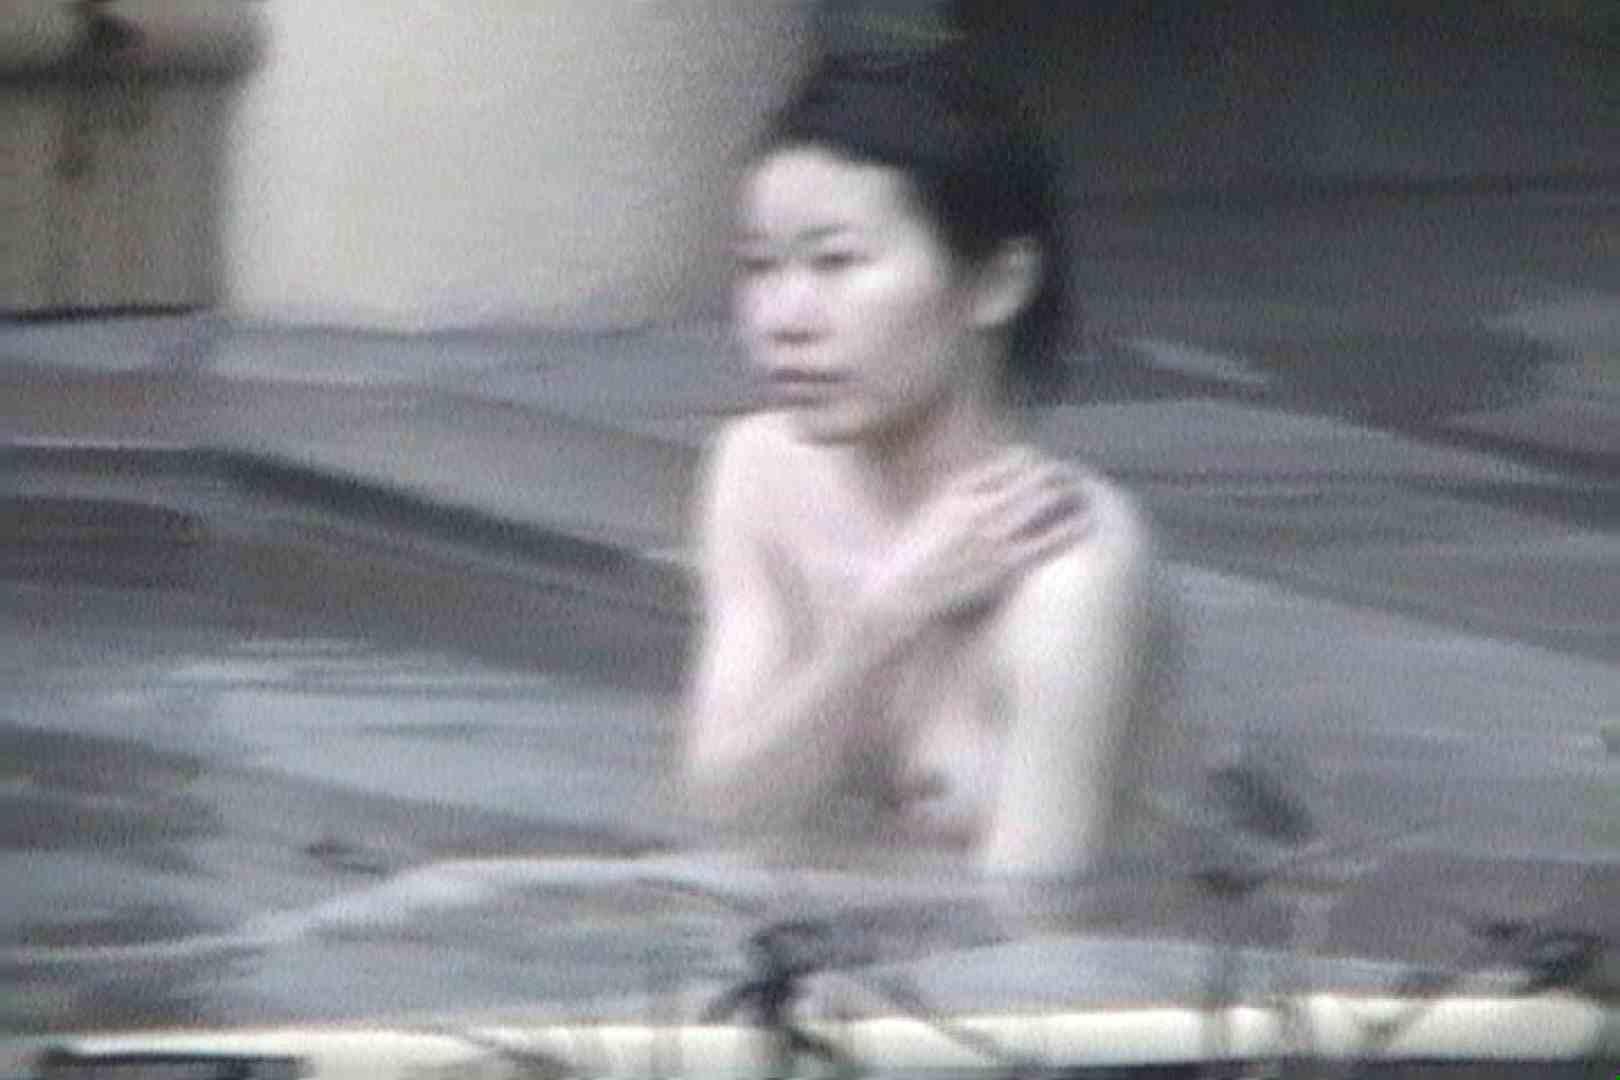 Aquaな露天風呂Vol.556 露天風呂編  99PIX 38